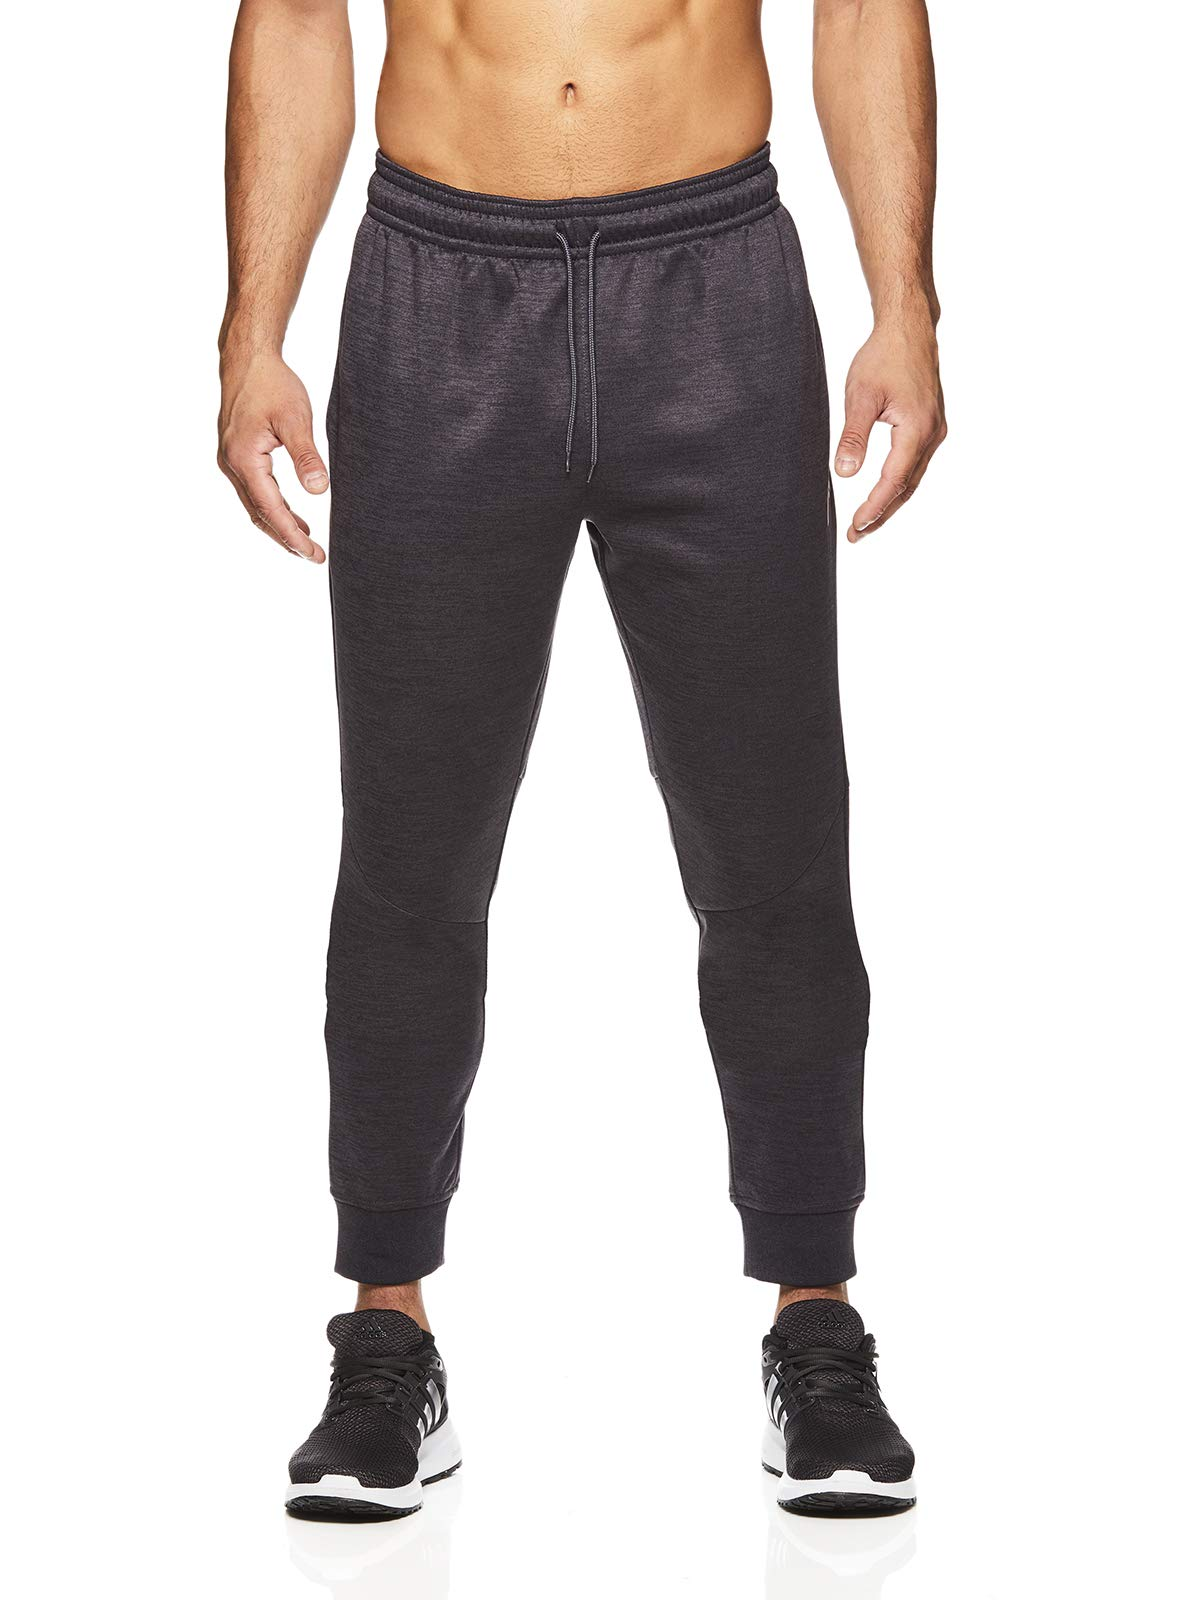 HEAD Men's Jogger Activewear Pants - Performance Workout & Running Sweatpants - Pro Nine Iron Heather, Small